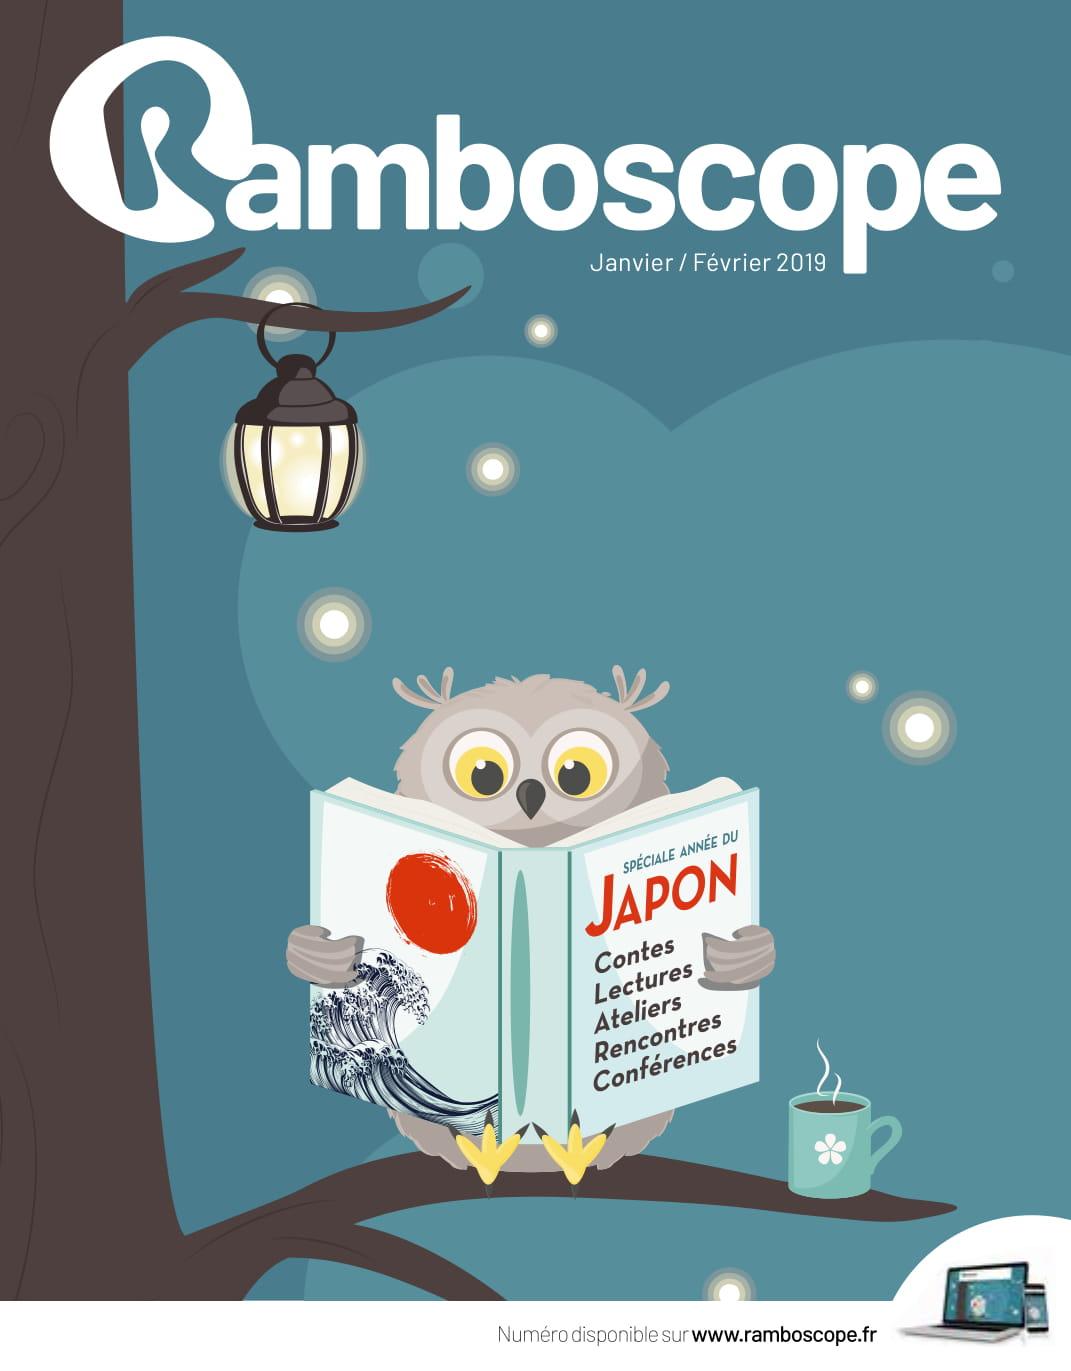 Ramboscope Janvier 2019